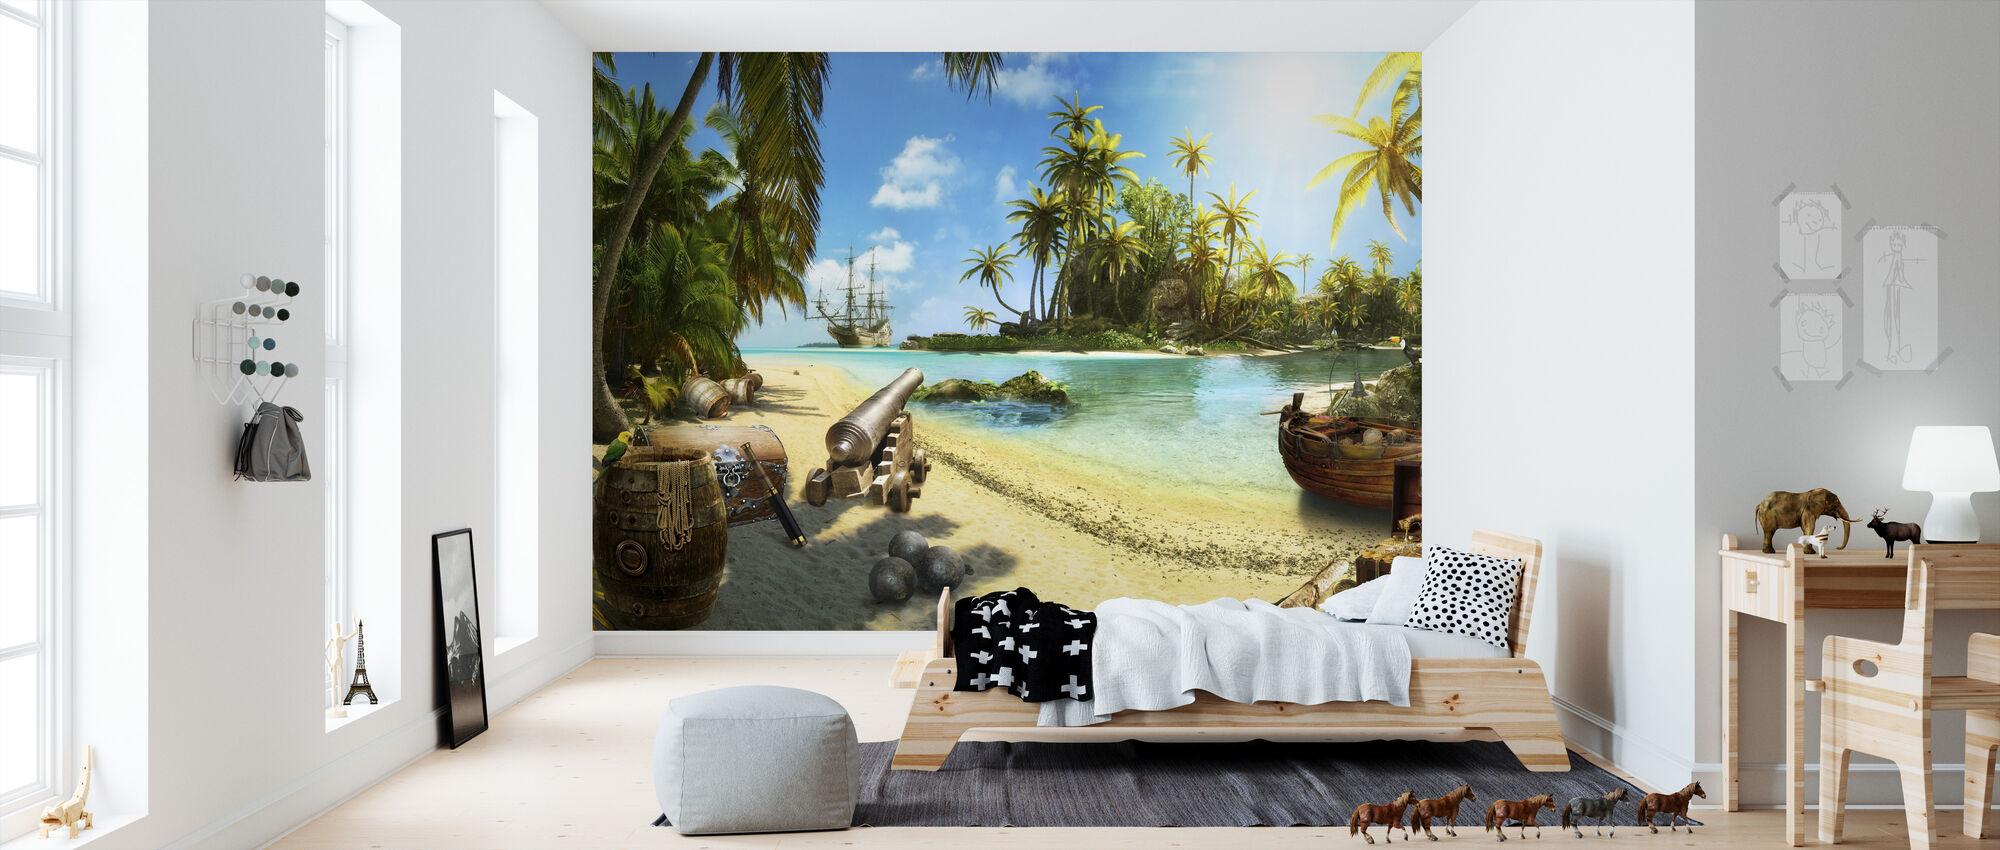 Pirat Island - Tapet - Børneværelse